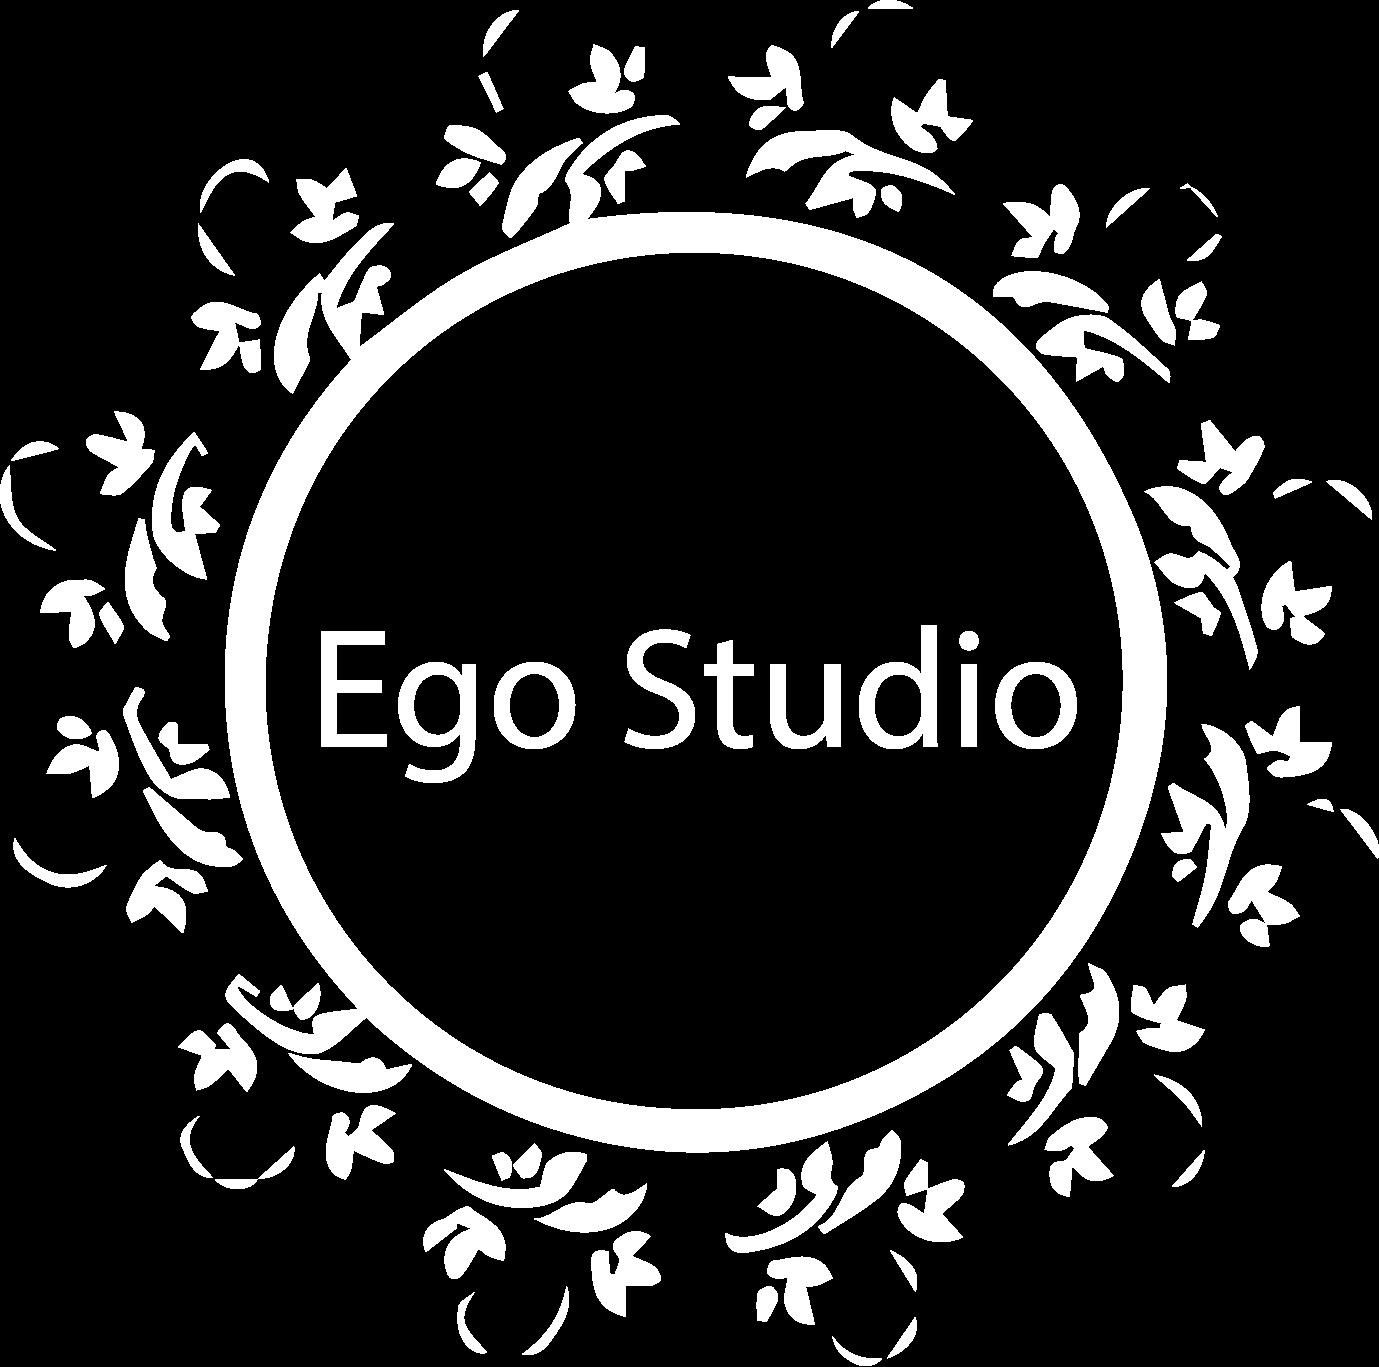 EGO STUDIO «VIP Massage» салон эротического массажа премиум класса Севастополь, ул. Колобова 34/1 +7 (989) 211 15 01